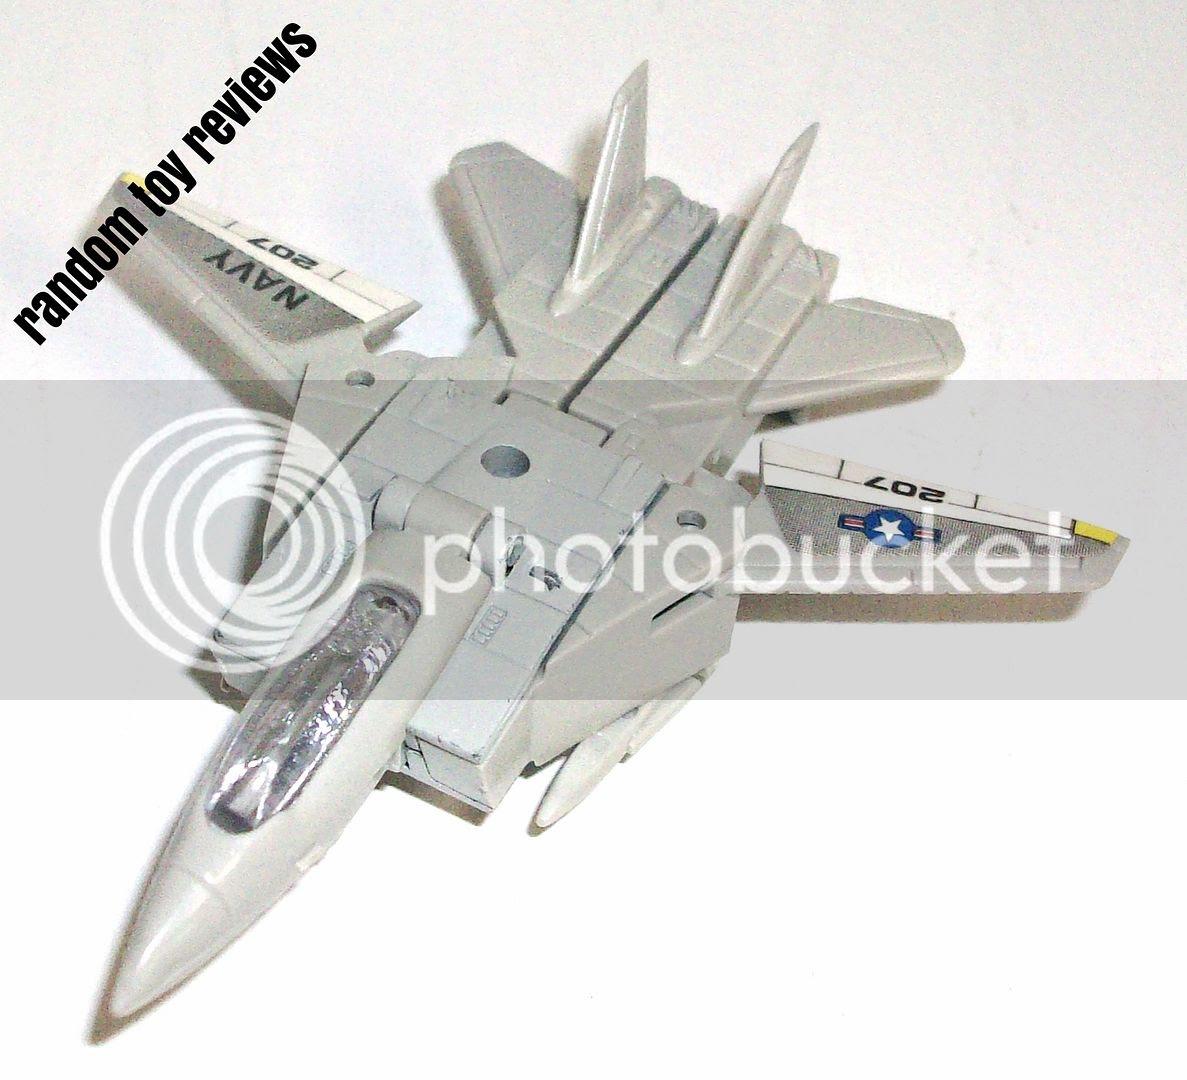 Henshin Robo jet photo 100_6653_zpsf622c4e3.jpg